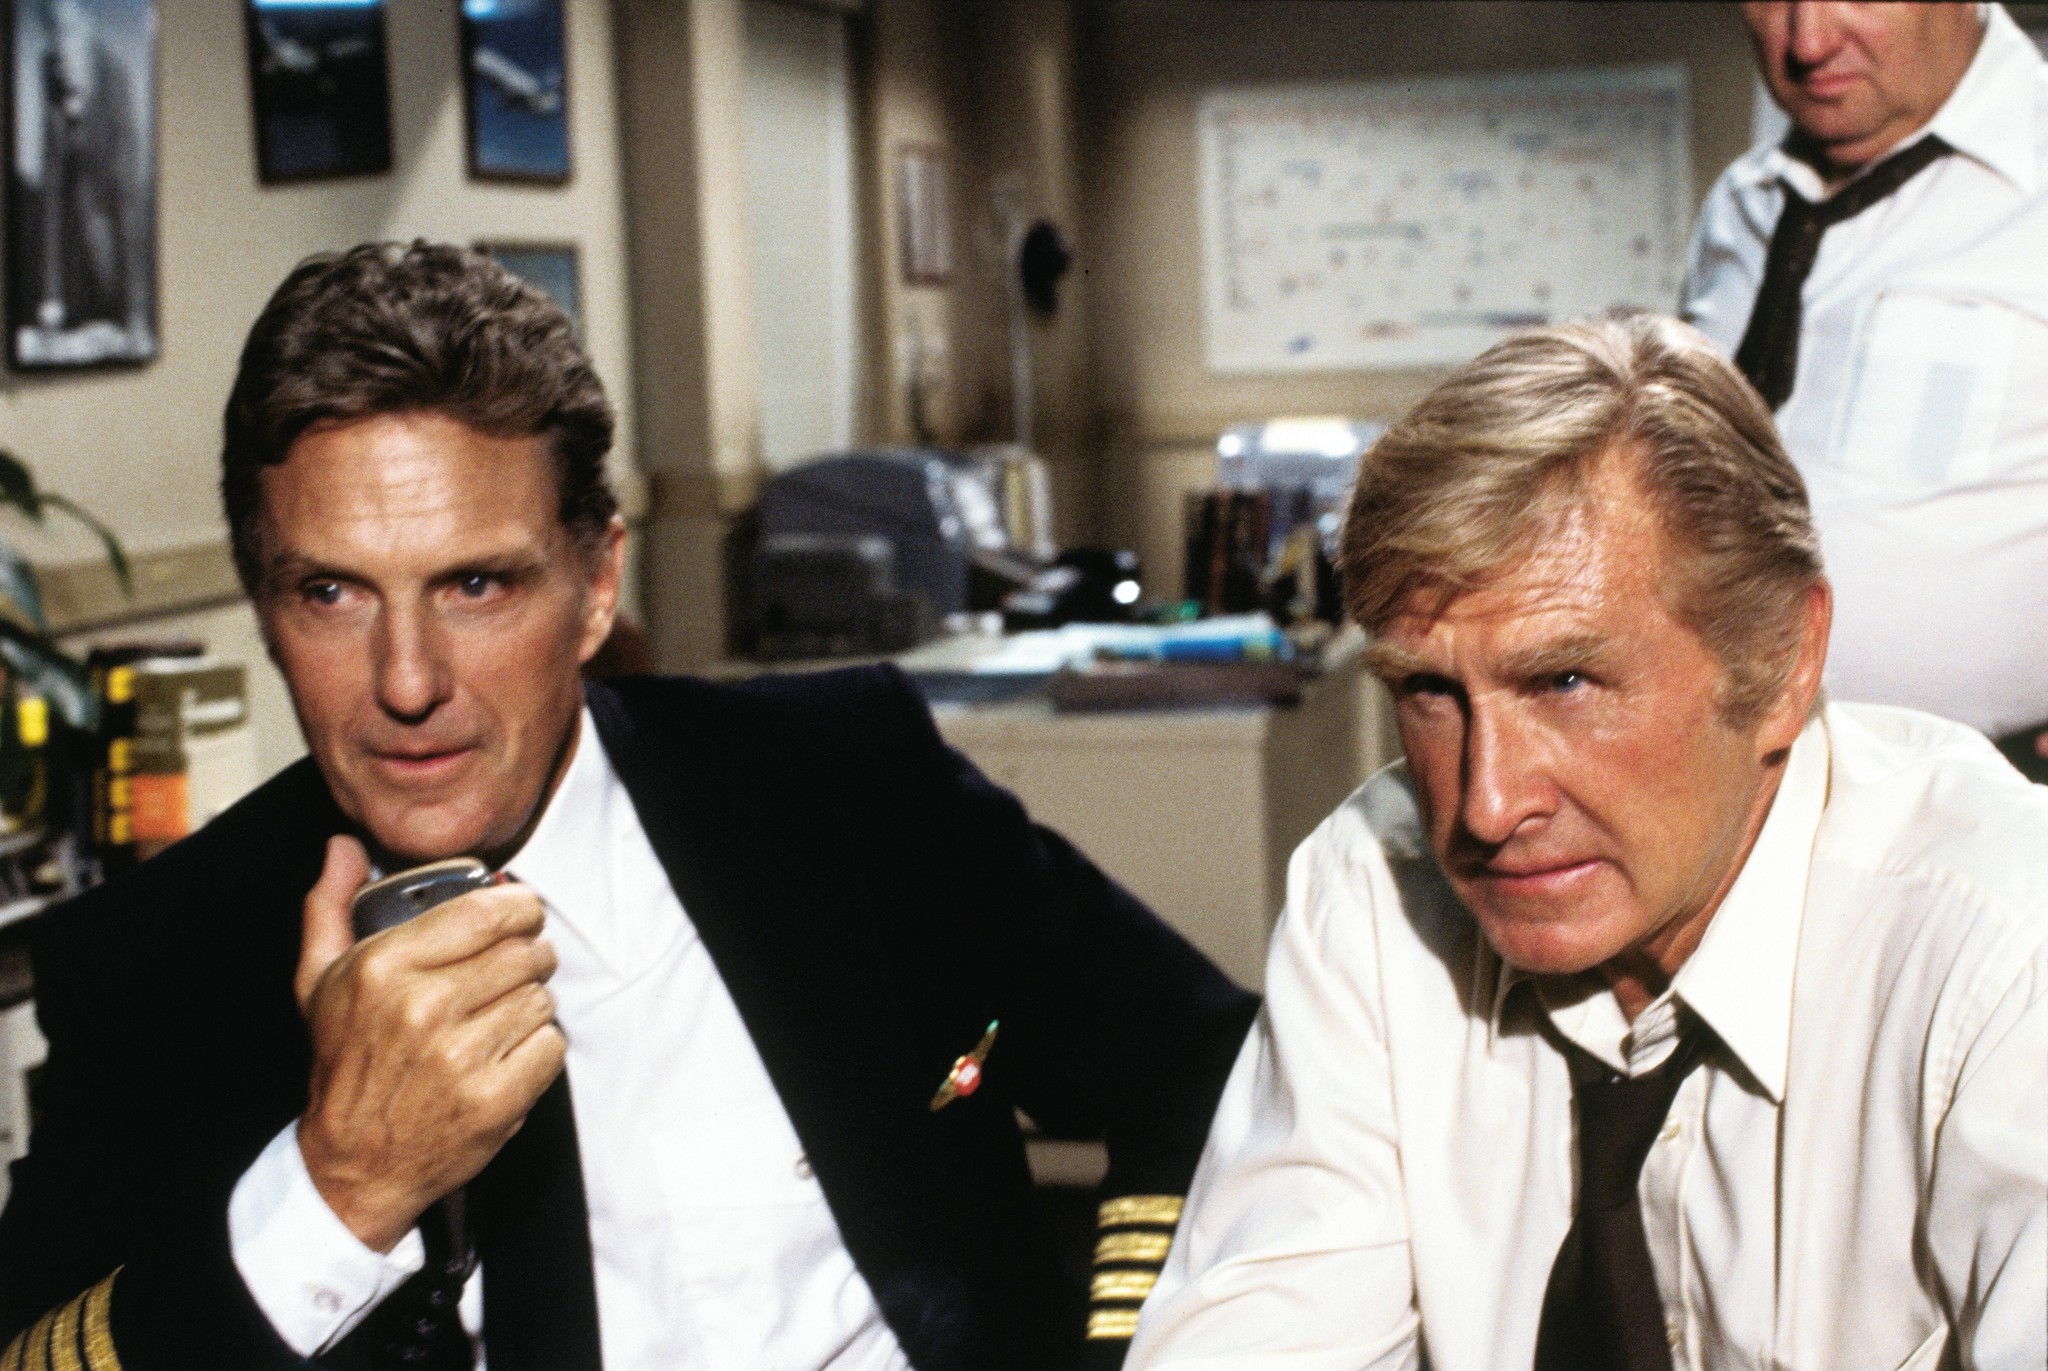 Lloyd Bridges and Robert Stack in Airplane! (1980)